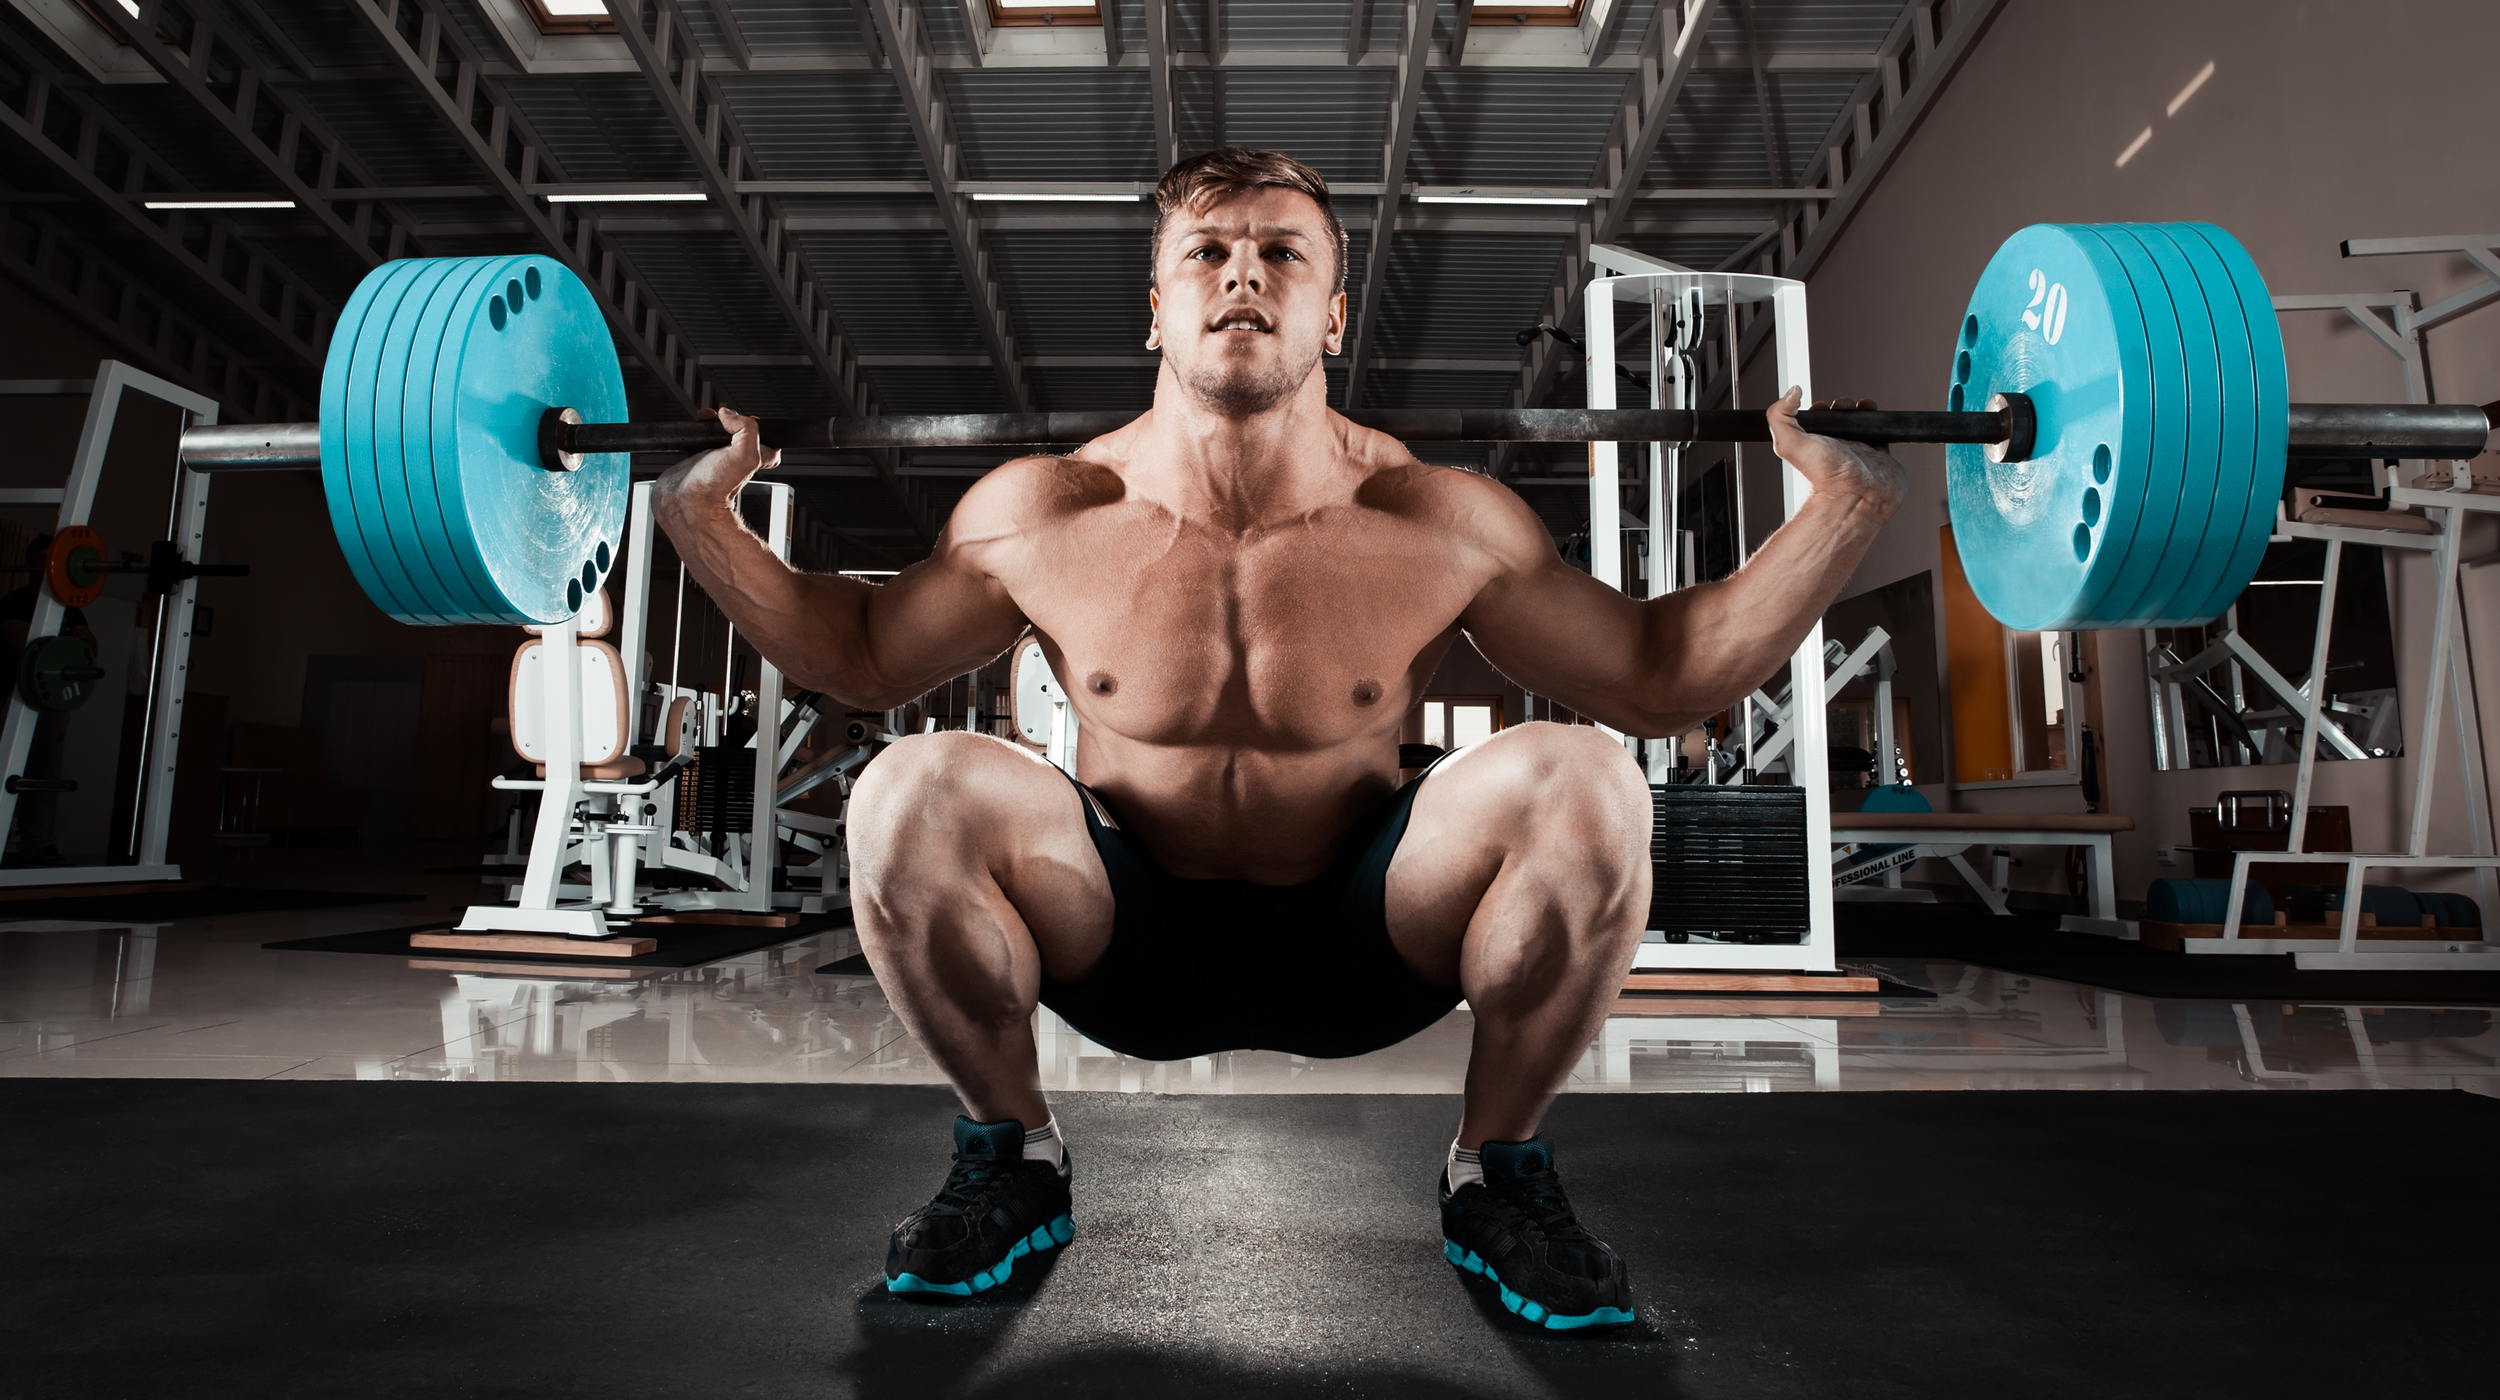 What Exercises are Best for Maximum Strength Gain?